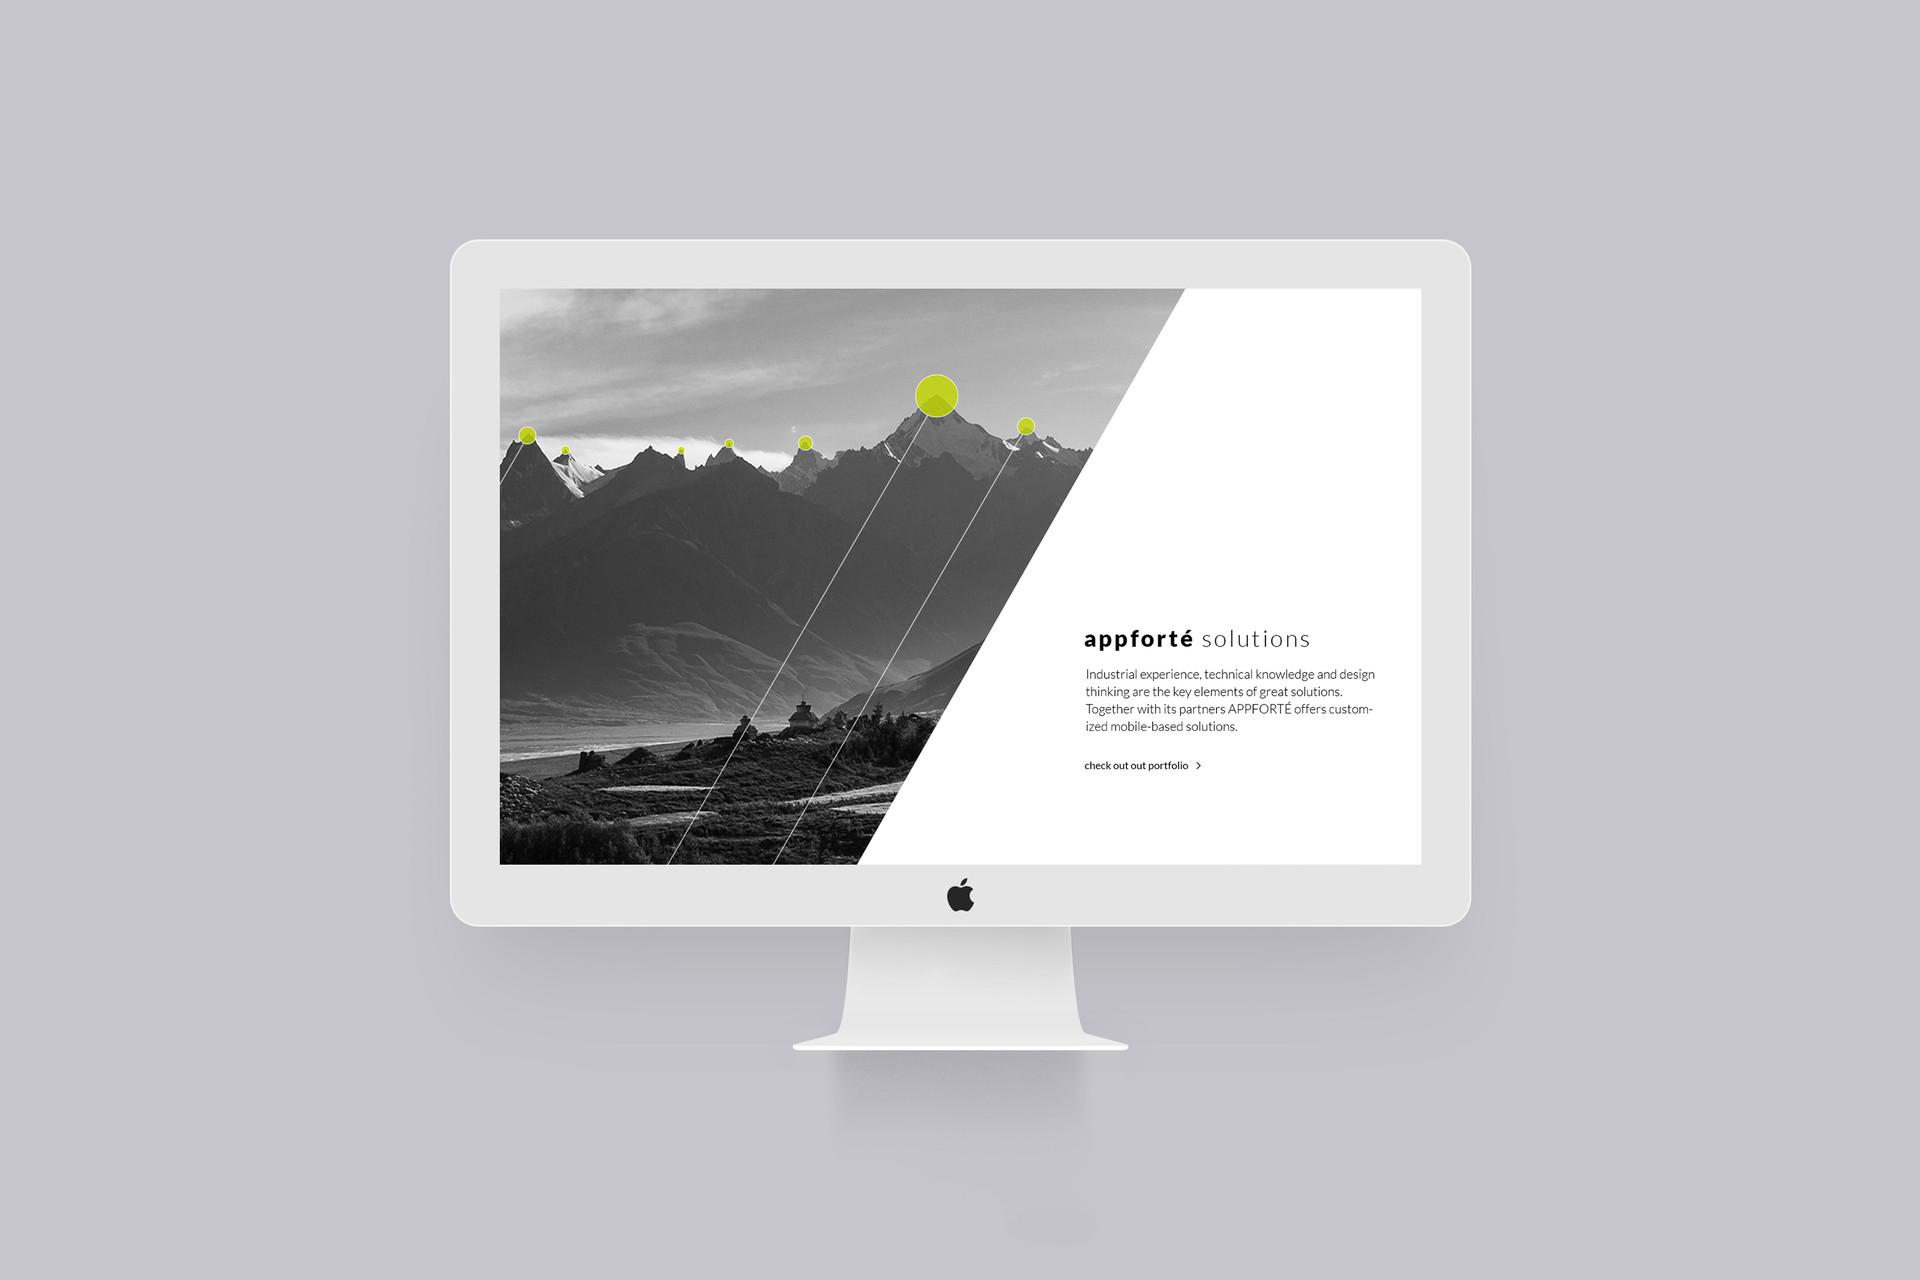 appforte web - solutions.jpg